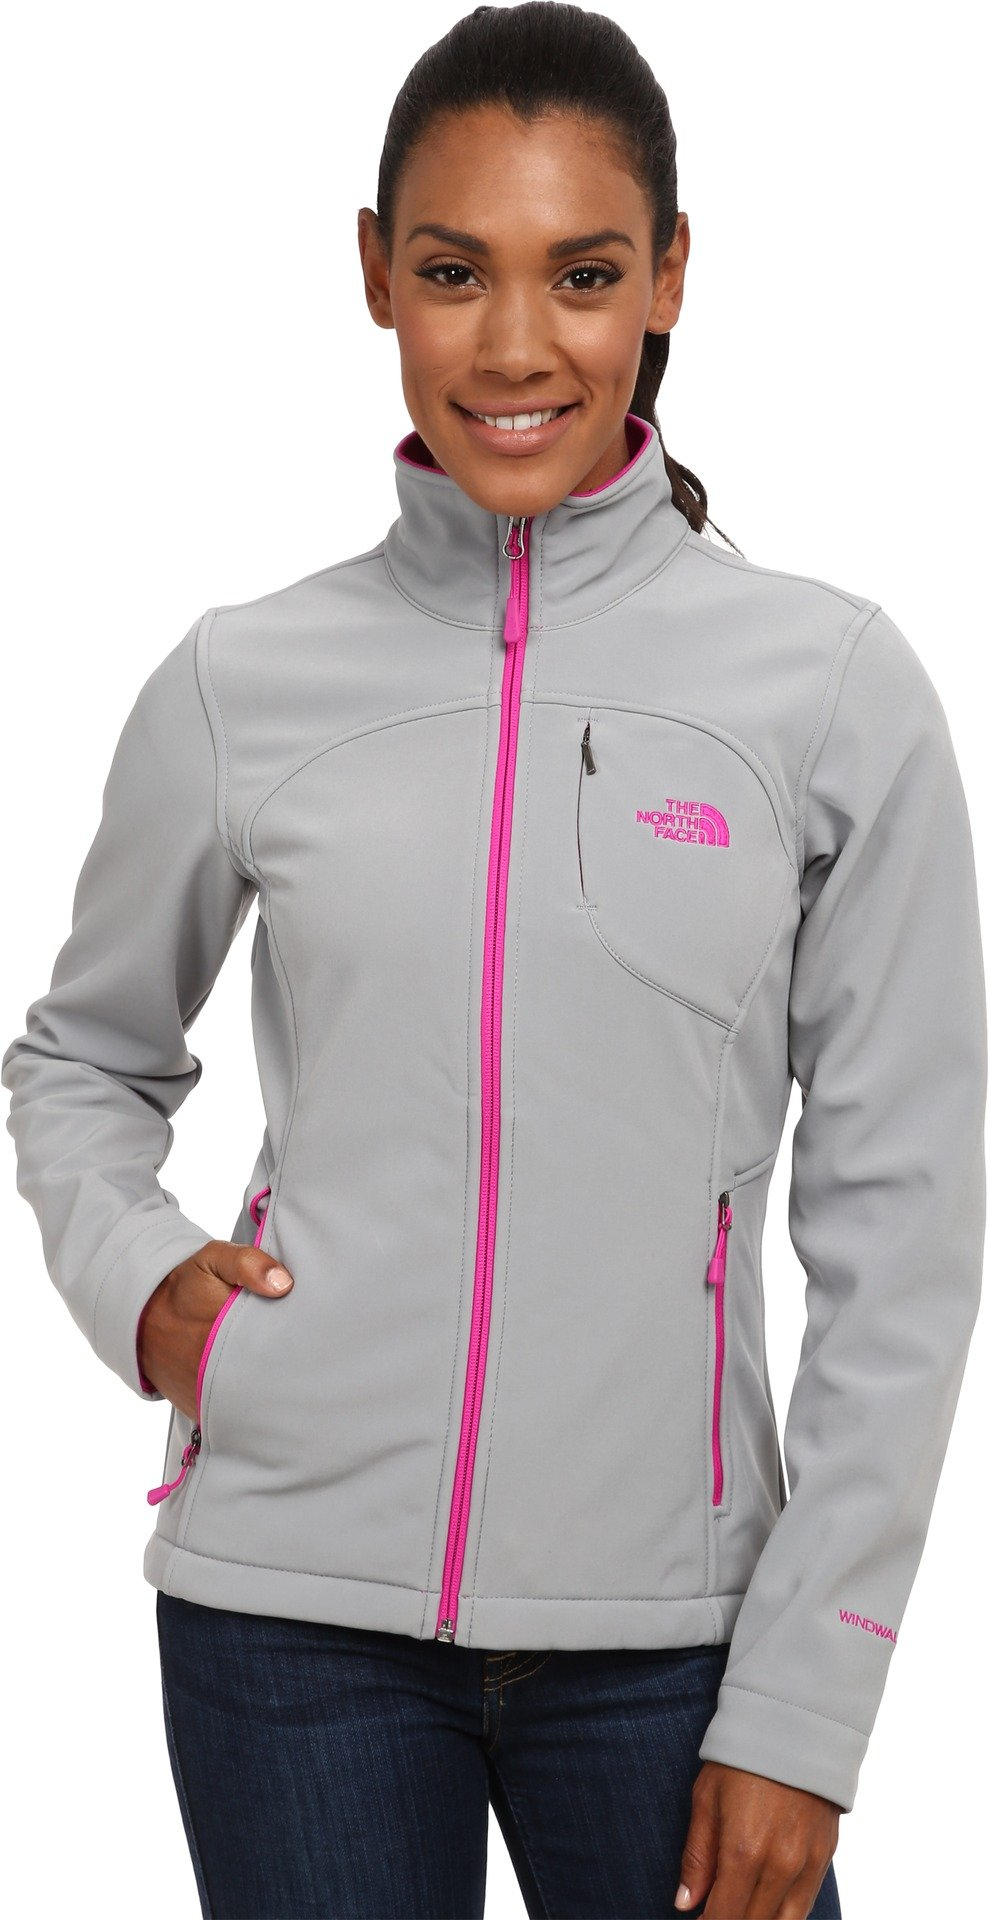 The North Face Women's Apex Bionic Jacket Mid Grey/Luminous Pink (Prior Season) Small